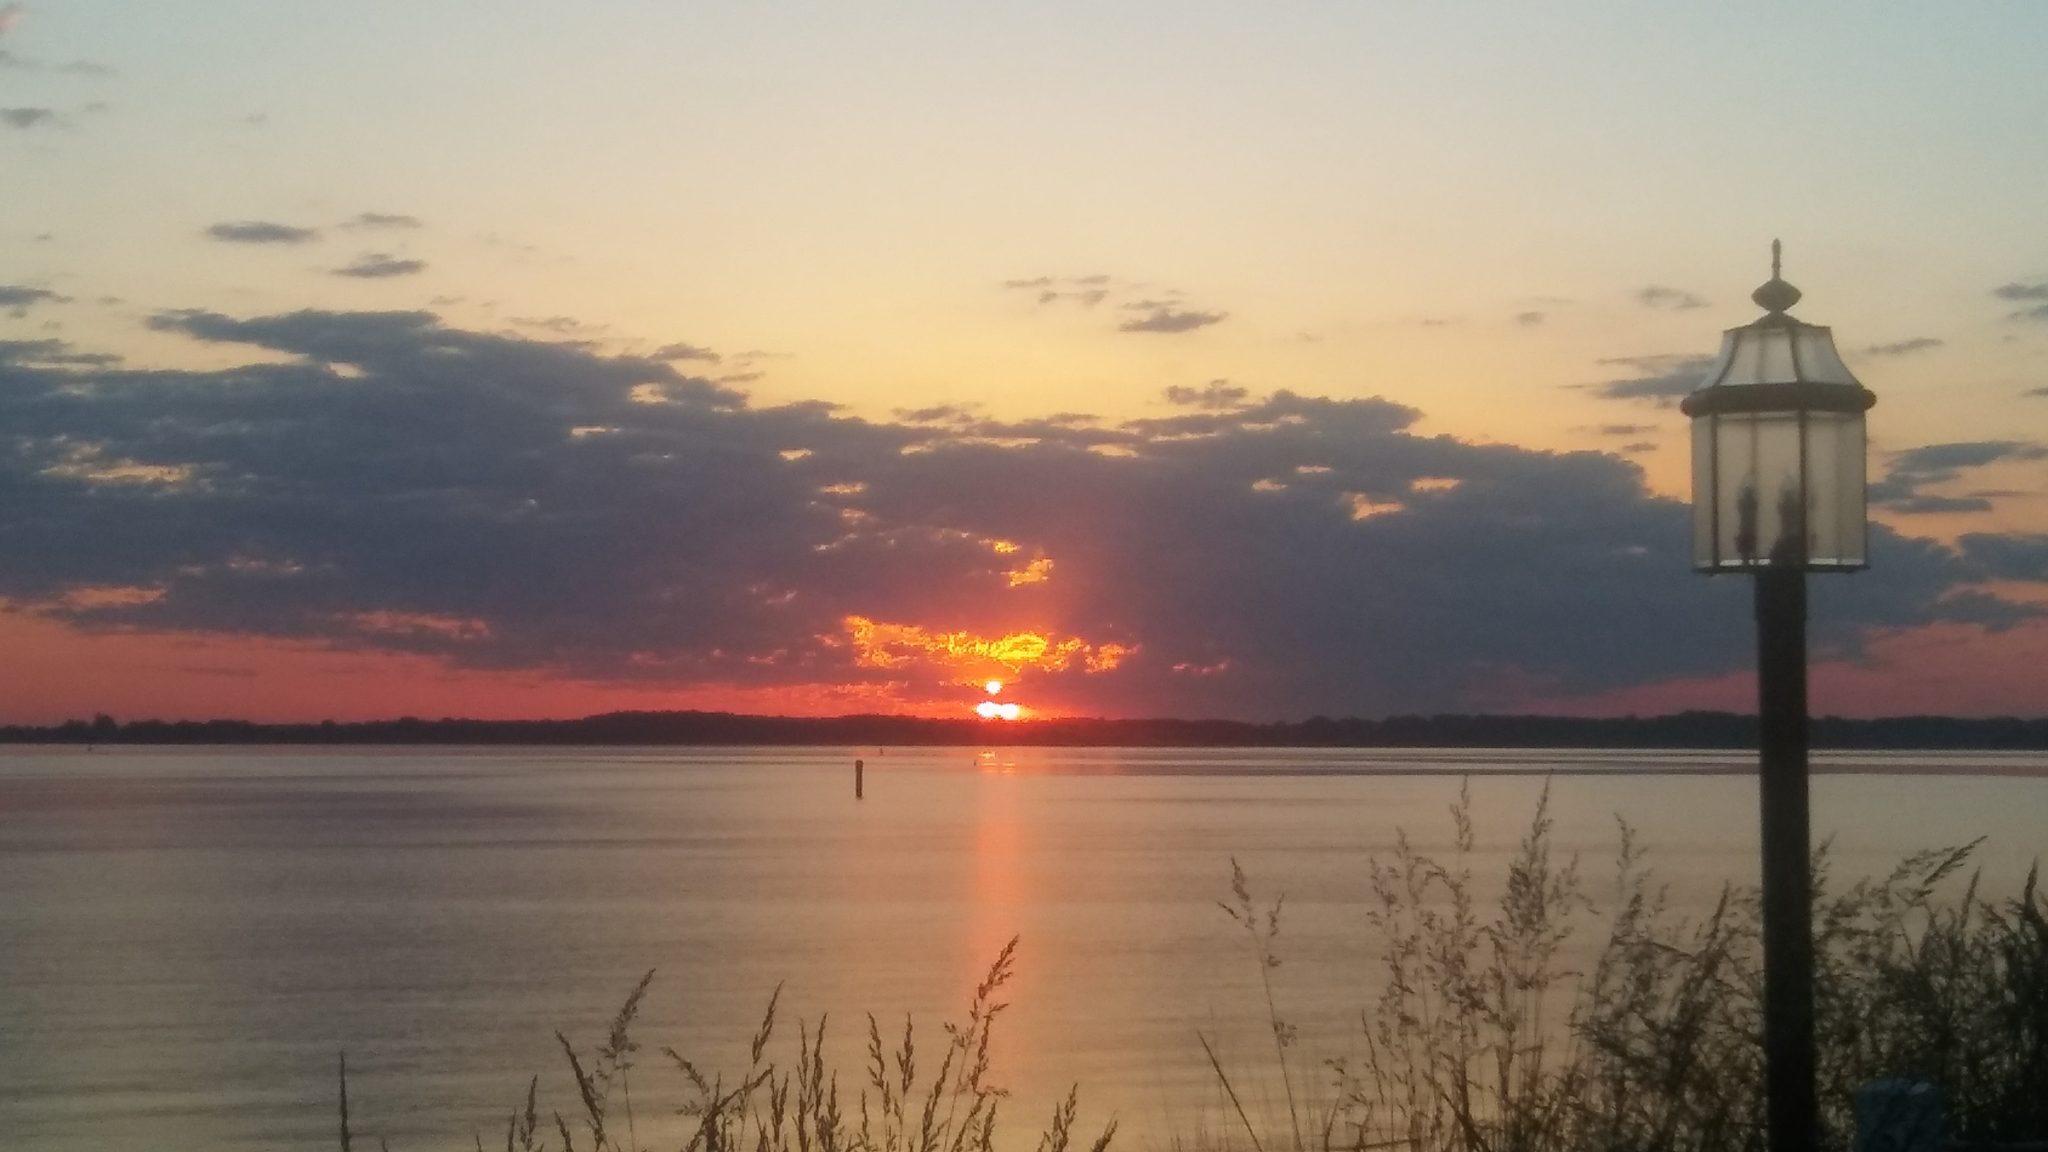 Sunrise in St. Michaels, MD